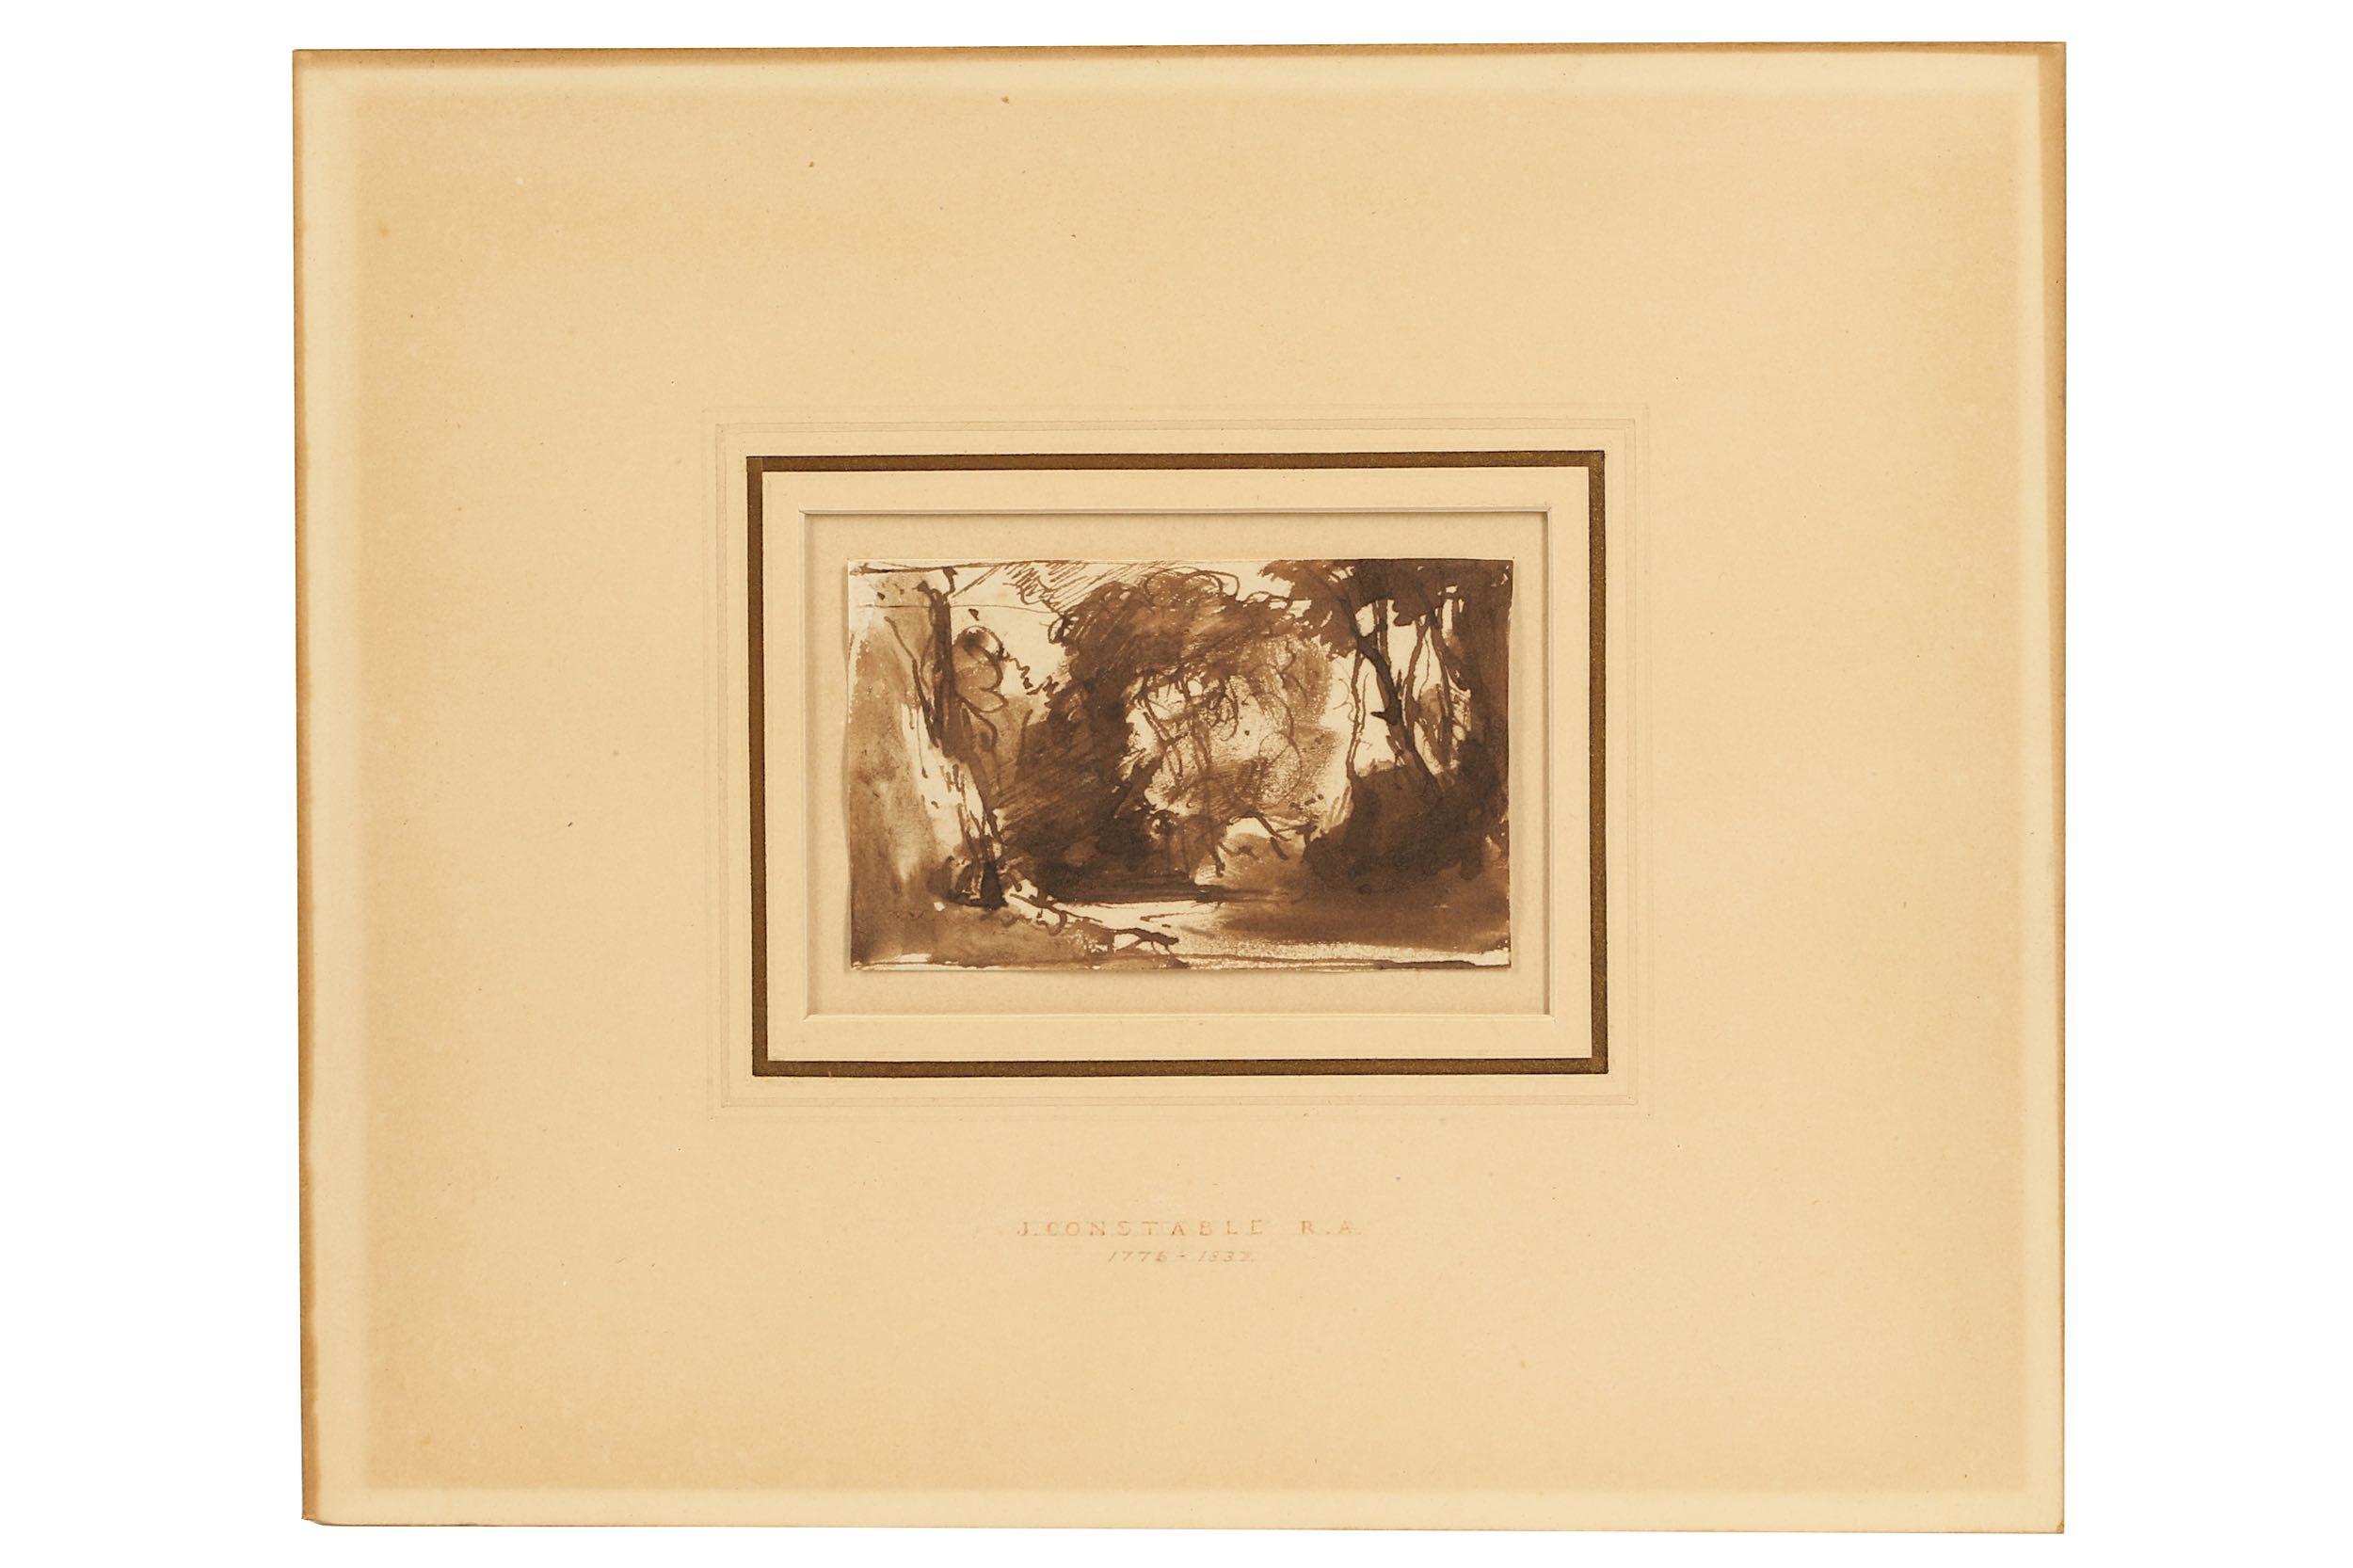 Lot 114 - JOHN CONSTABLE RA (BRITISH 1776 -1837)